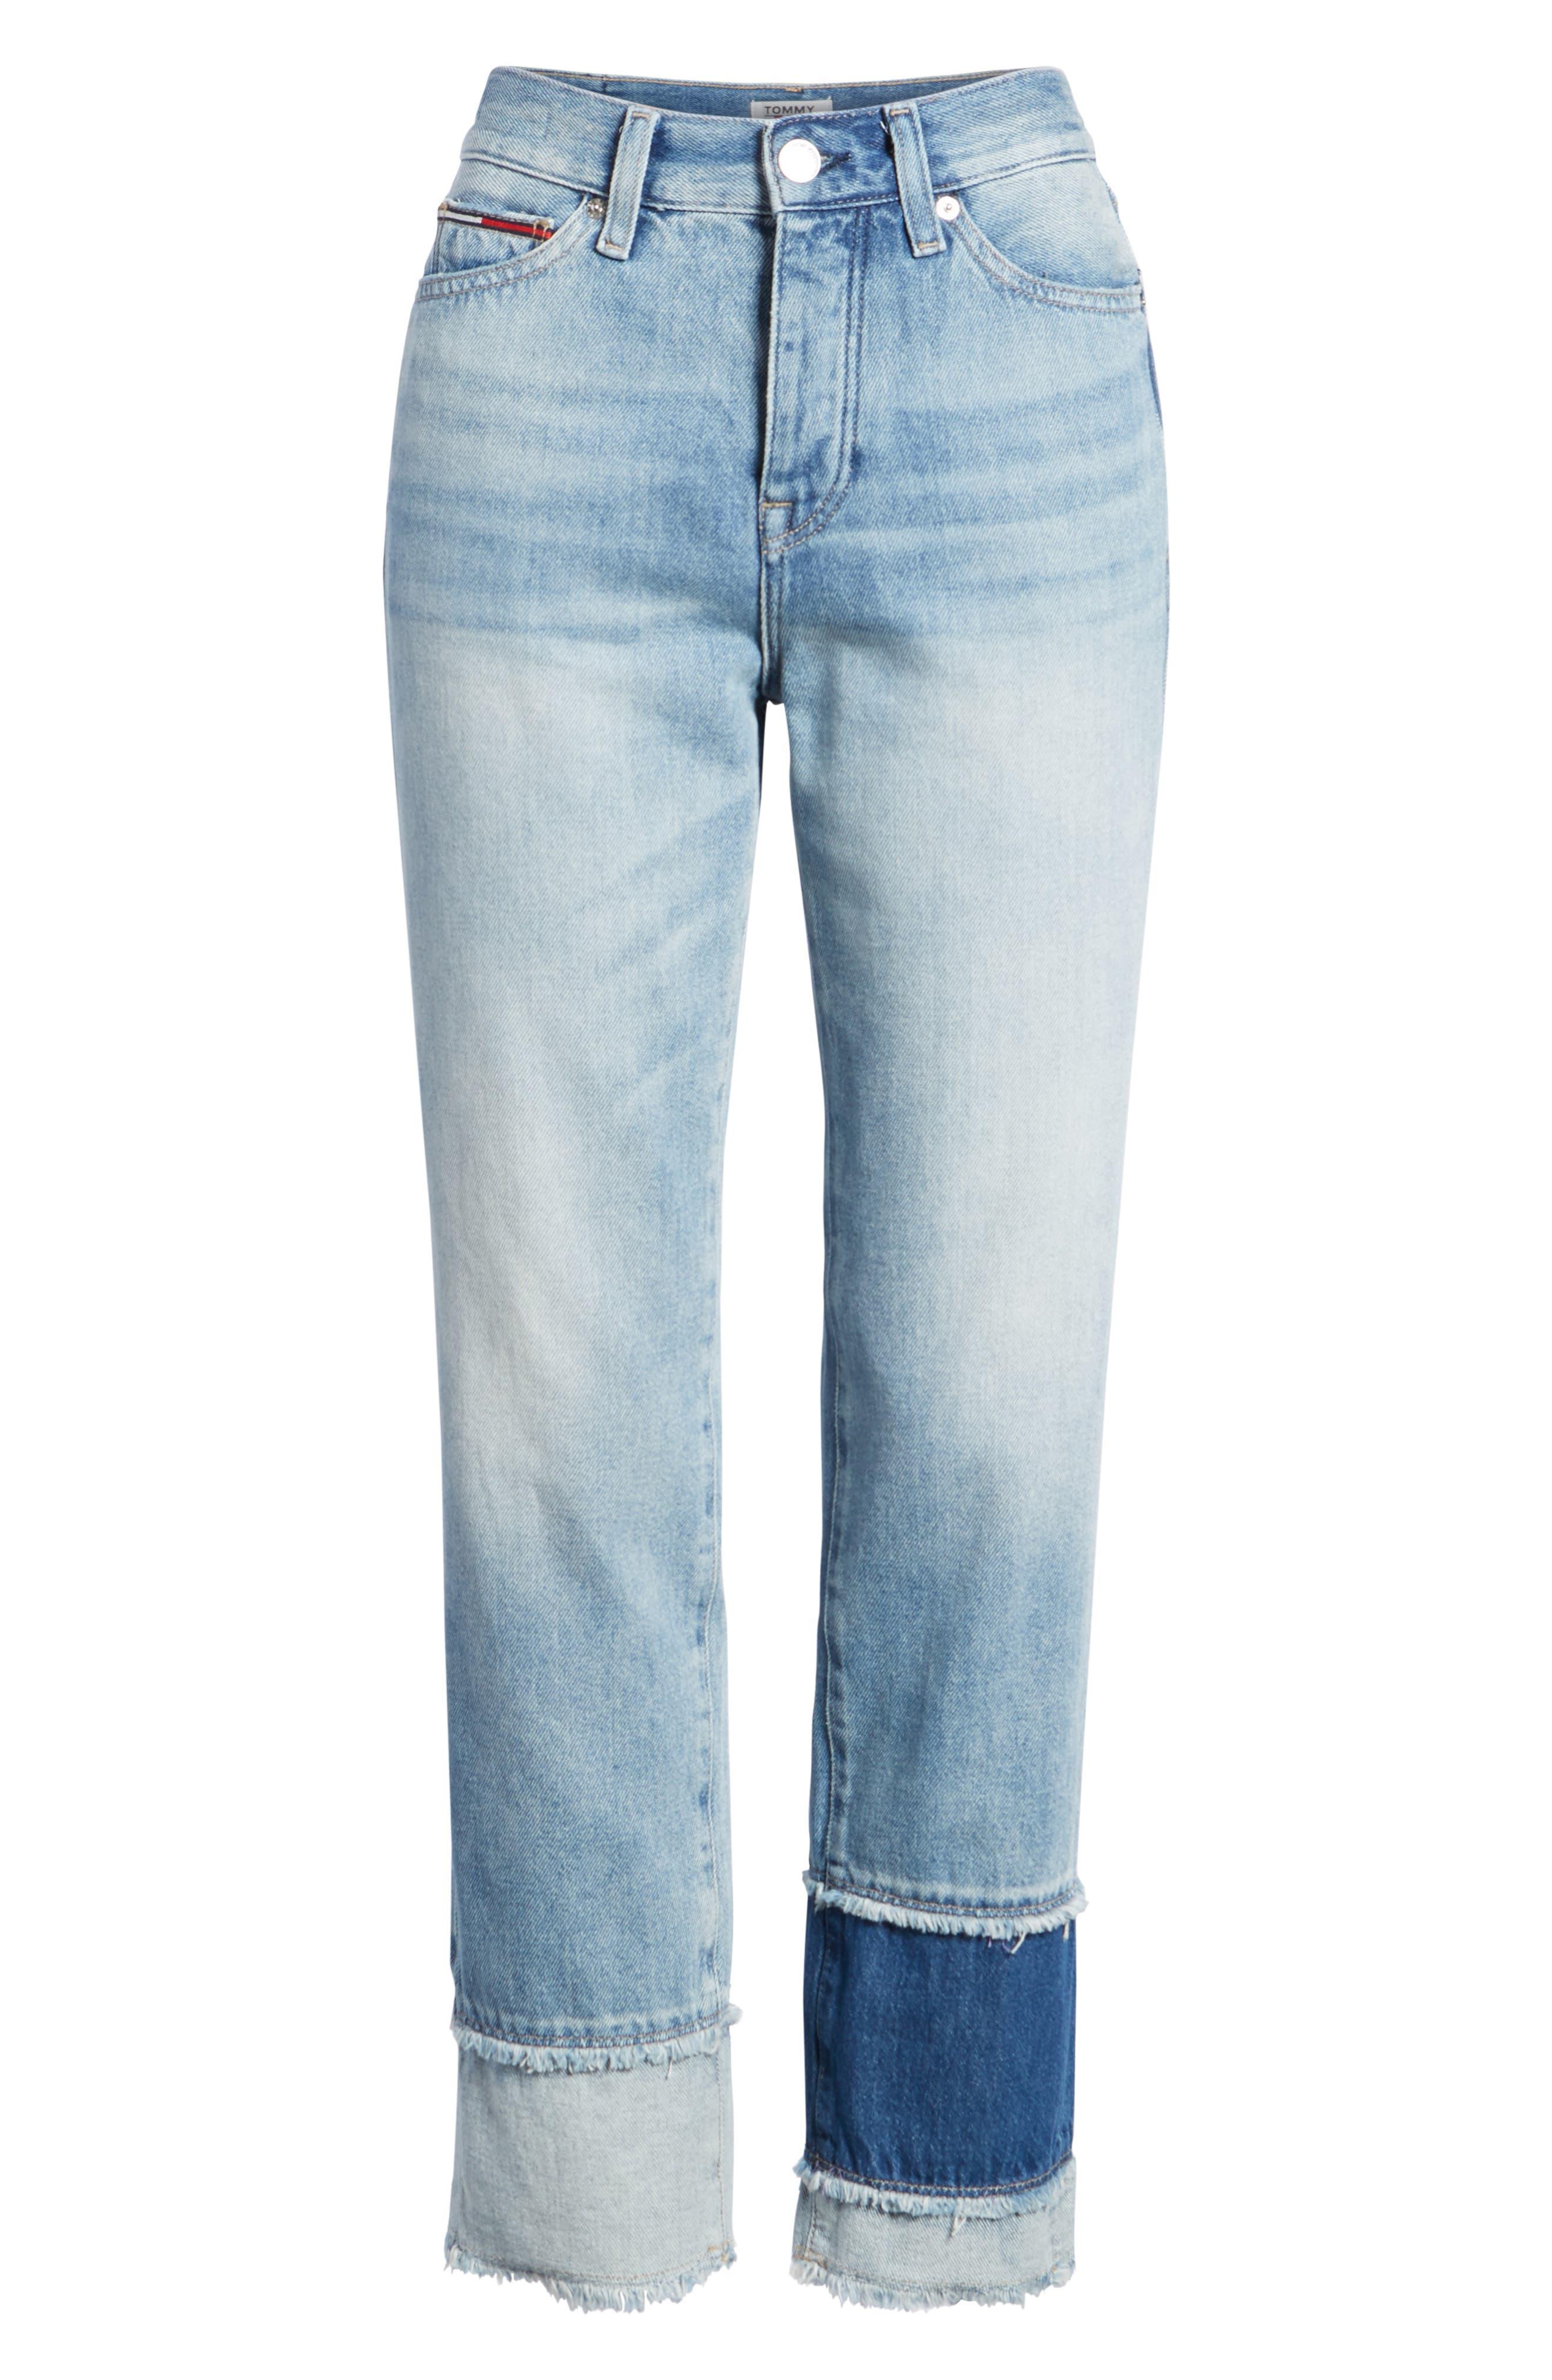 Izzy Layered Cuff Slim Leg Jeans,                             Alternate thumbnail 7, color,                             Raw Patch Light Blue Rigid